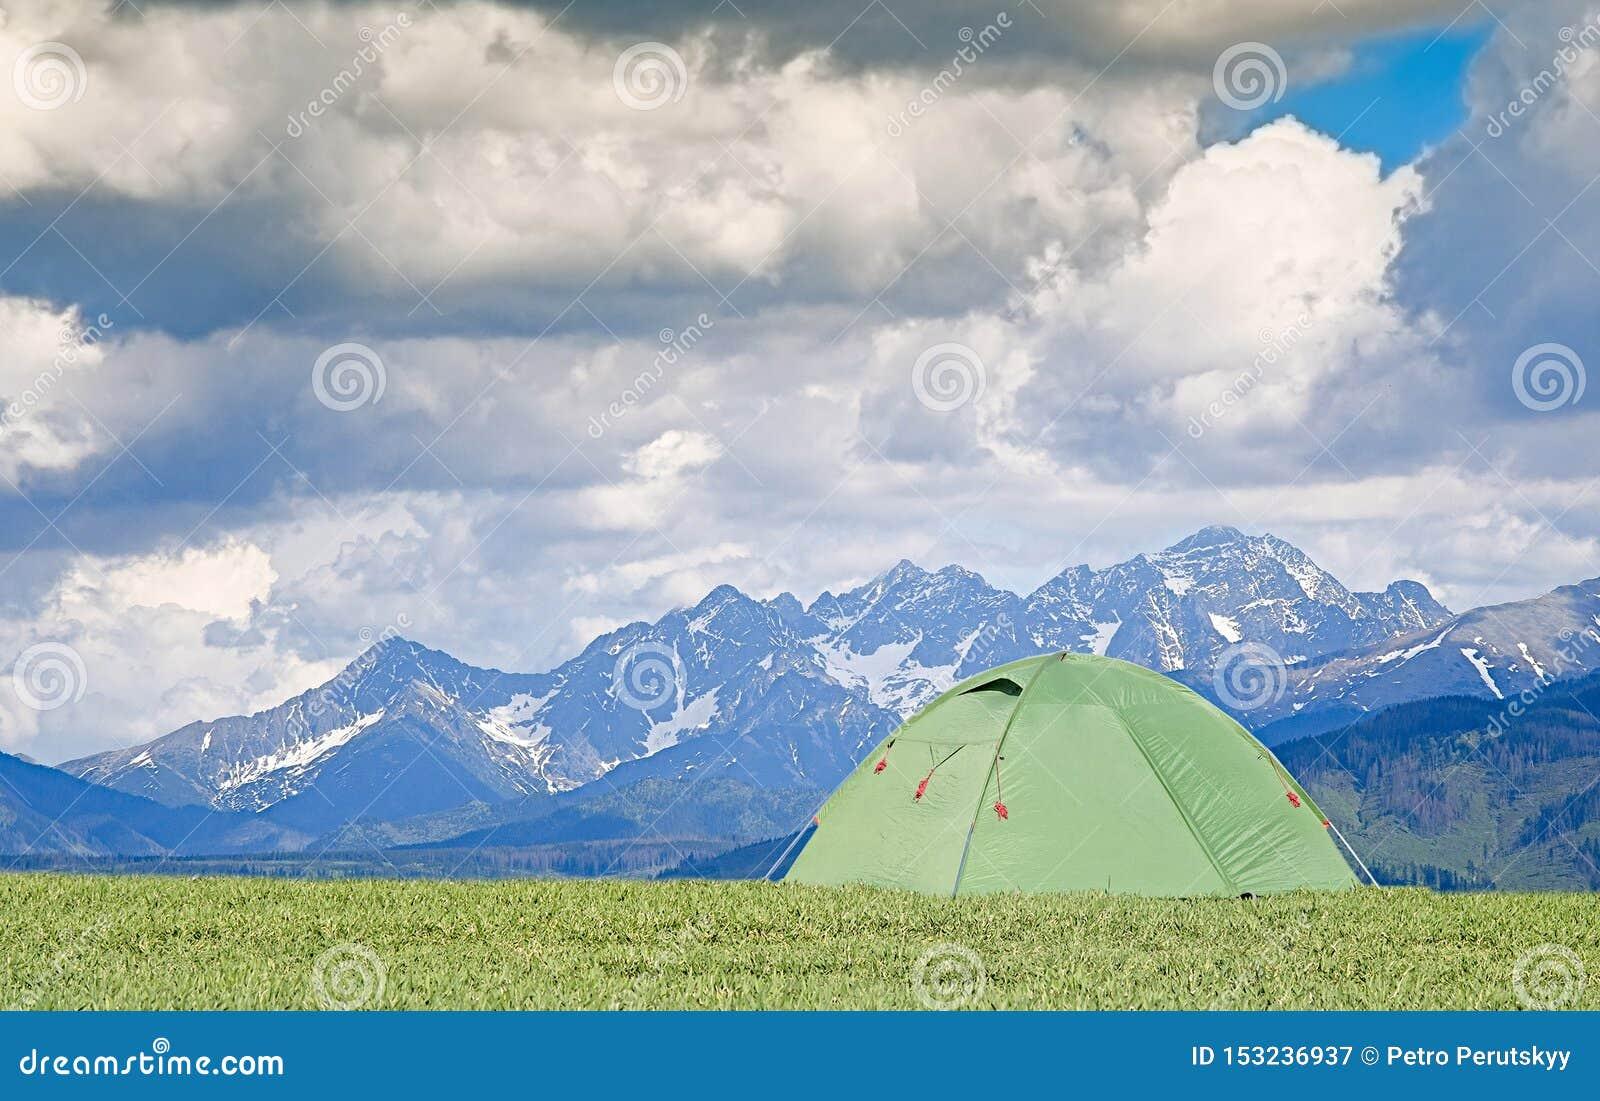 Tourist pitch a tent